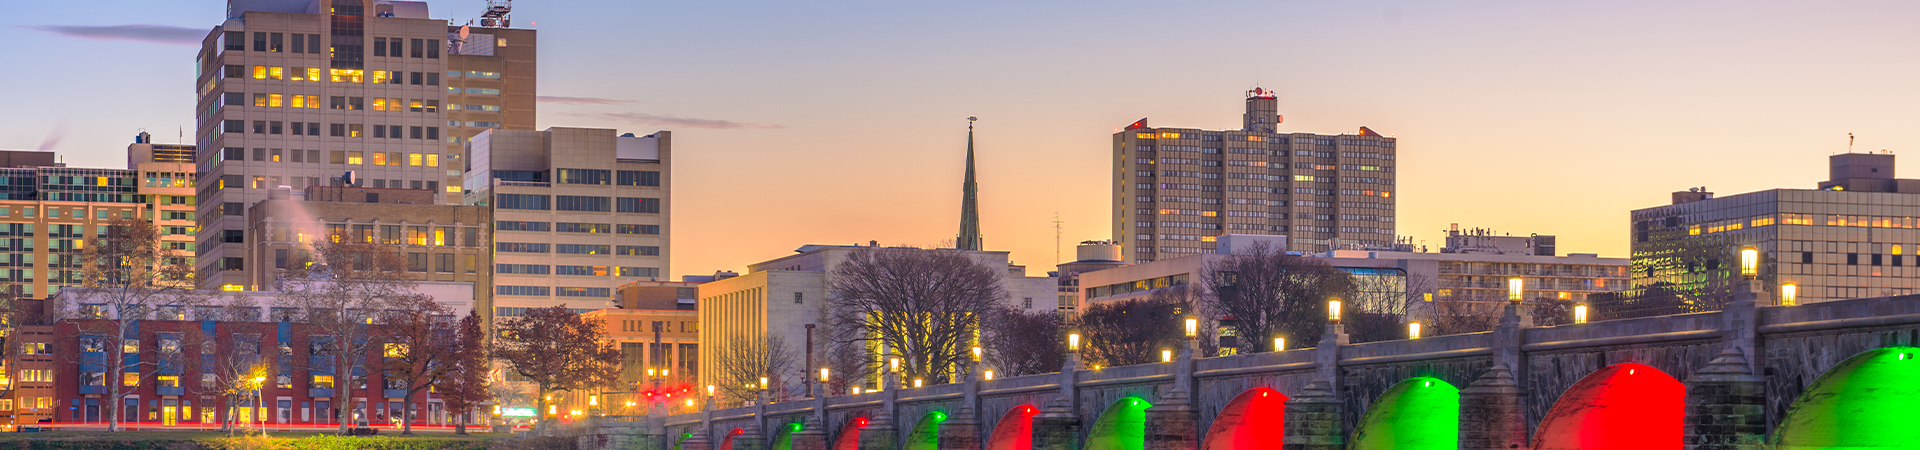 Mechanicsburg, PA skyline